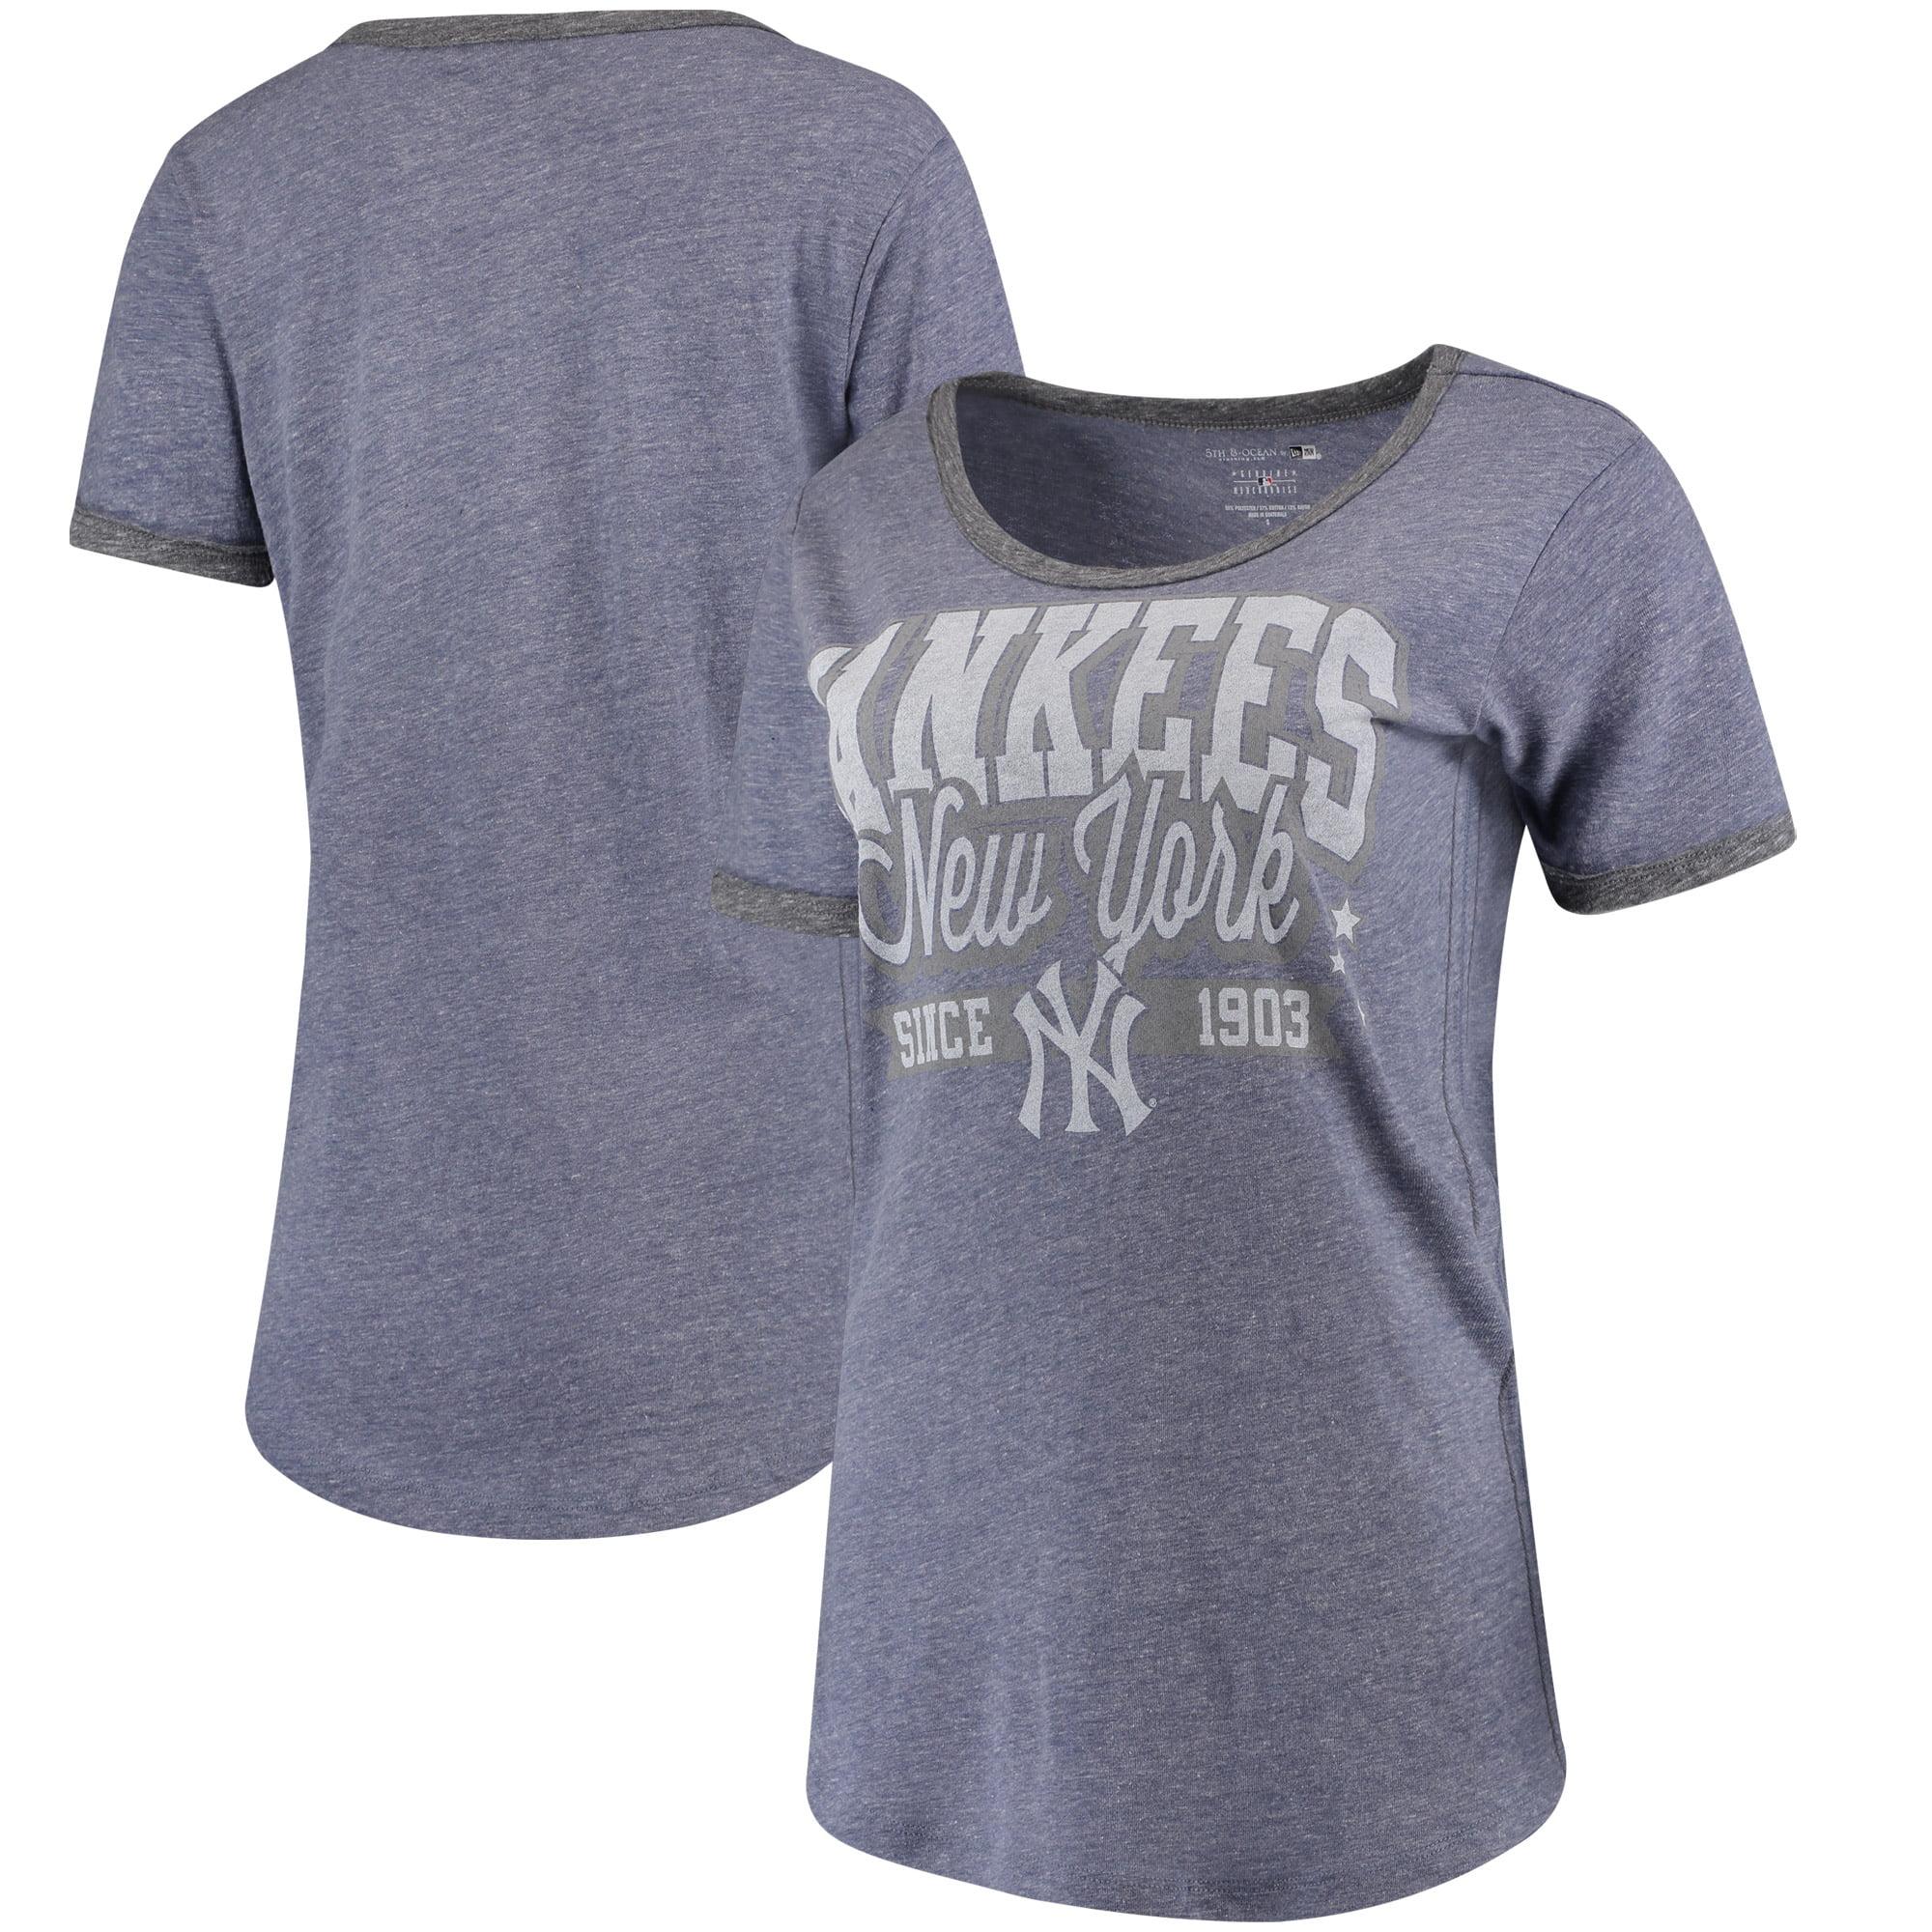 New York Yankees 5th & Ocean by New Era Women's Jersey Ringer Tri-Blend T-Shirt - Navy/Charcoal